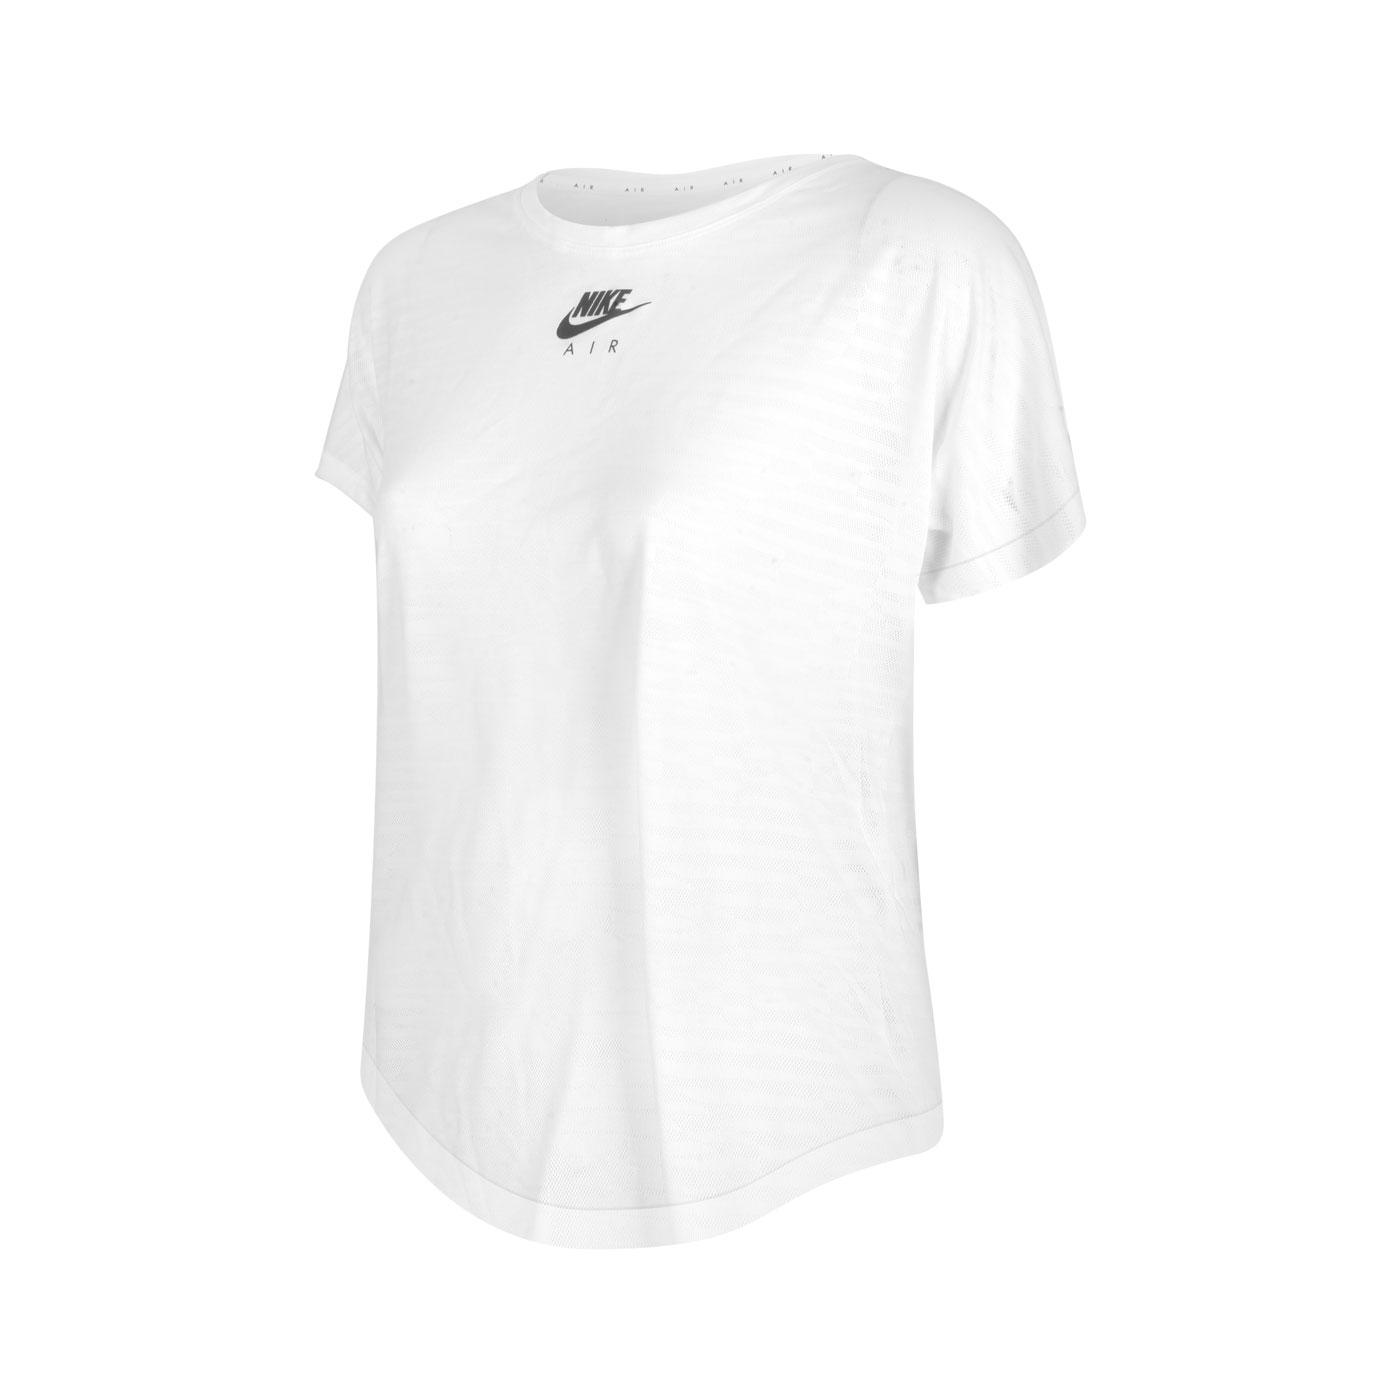 NIKE 女款短袖T恤 CZ9155-100 - 白黑